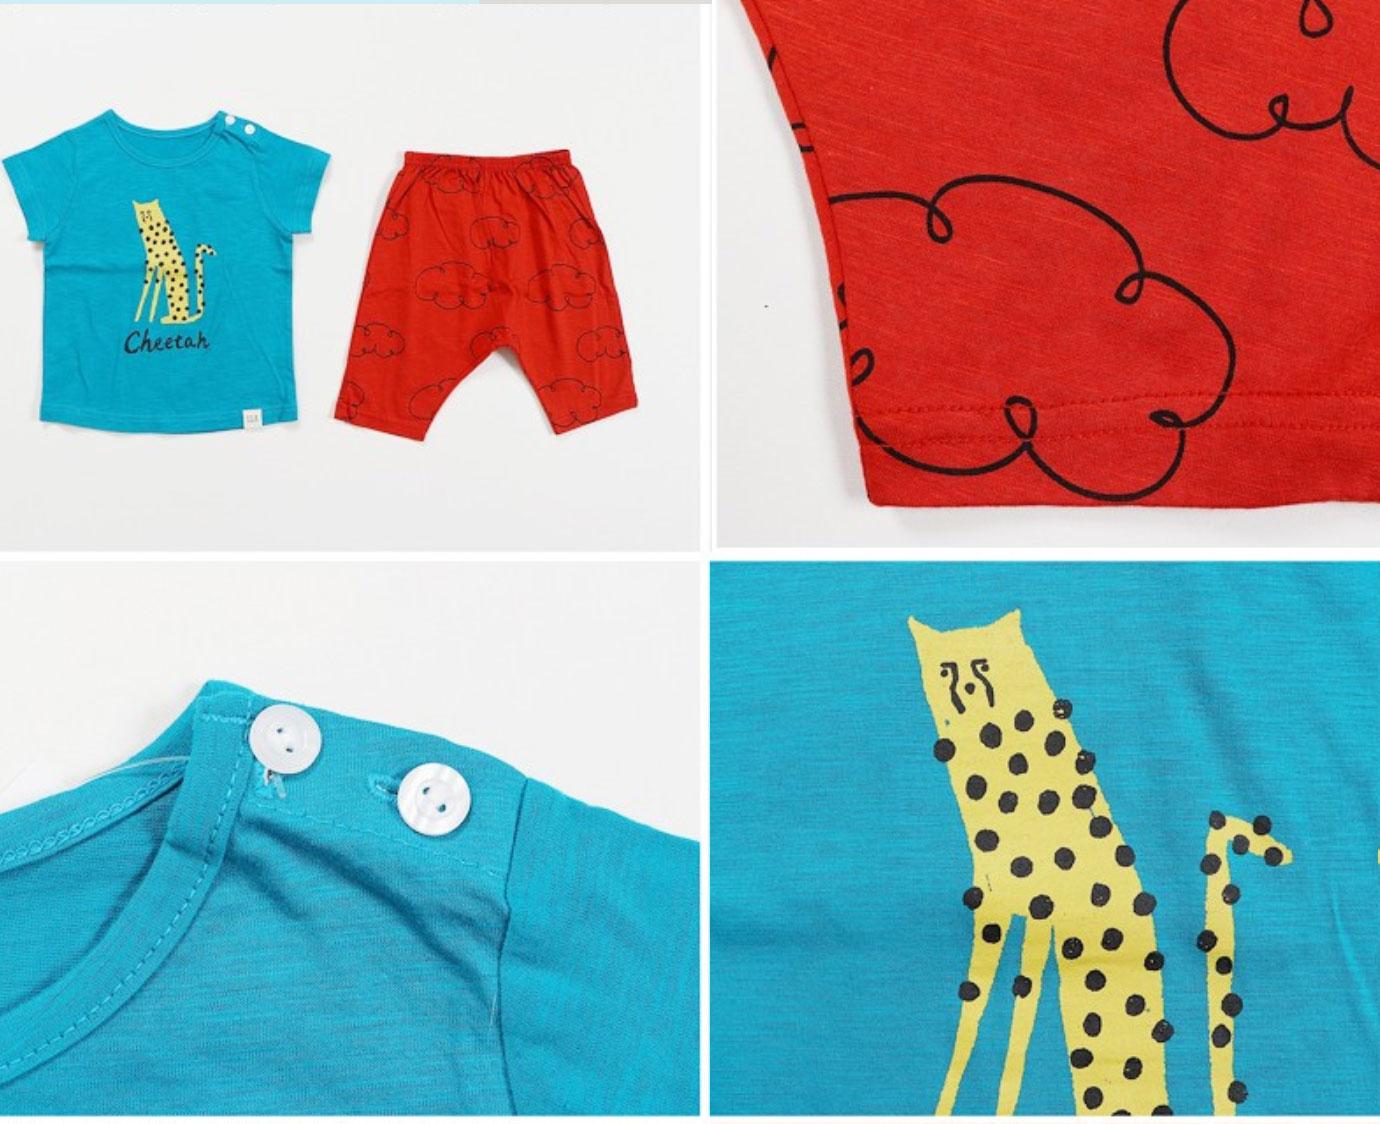 Loungewear 'Cheetah'